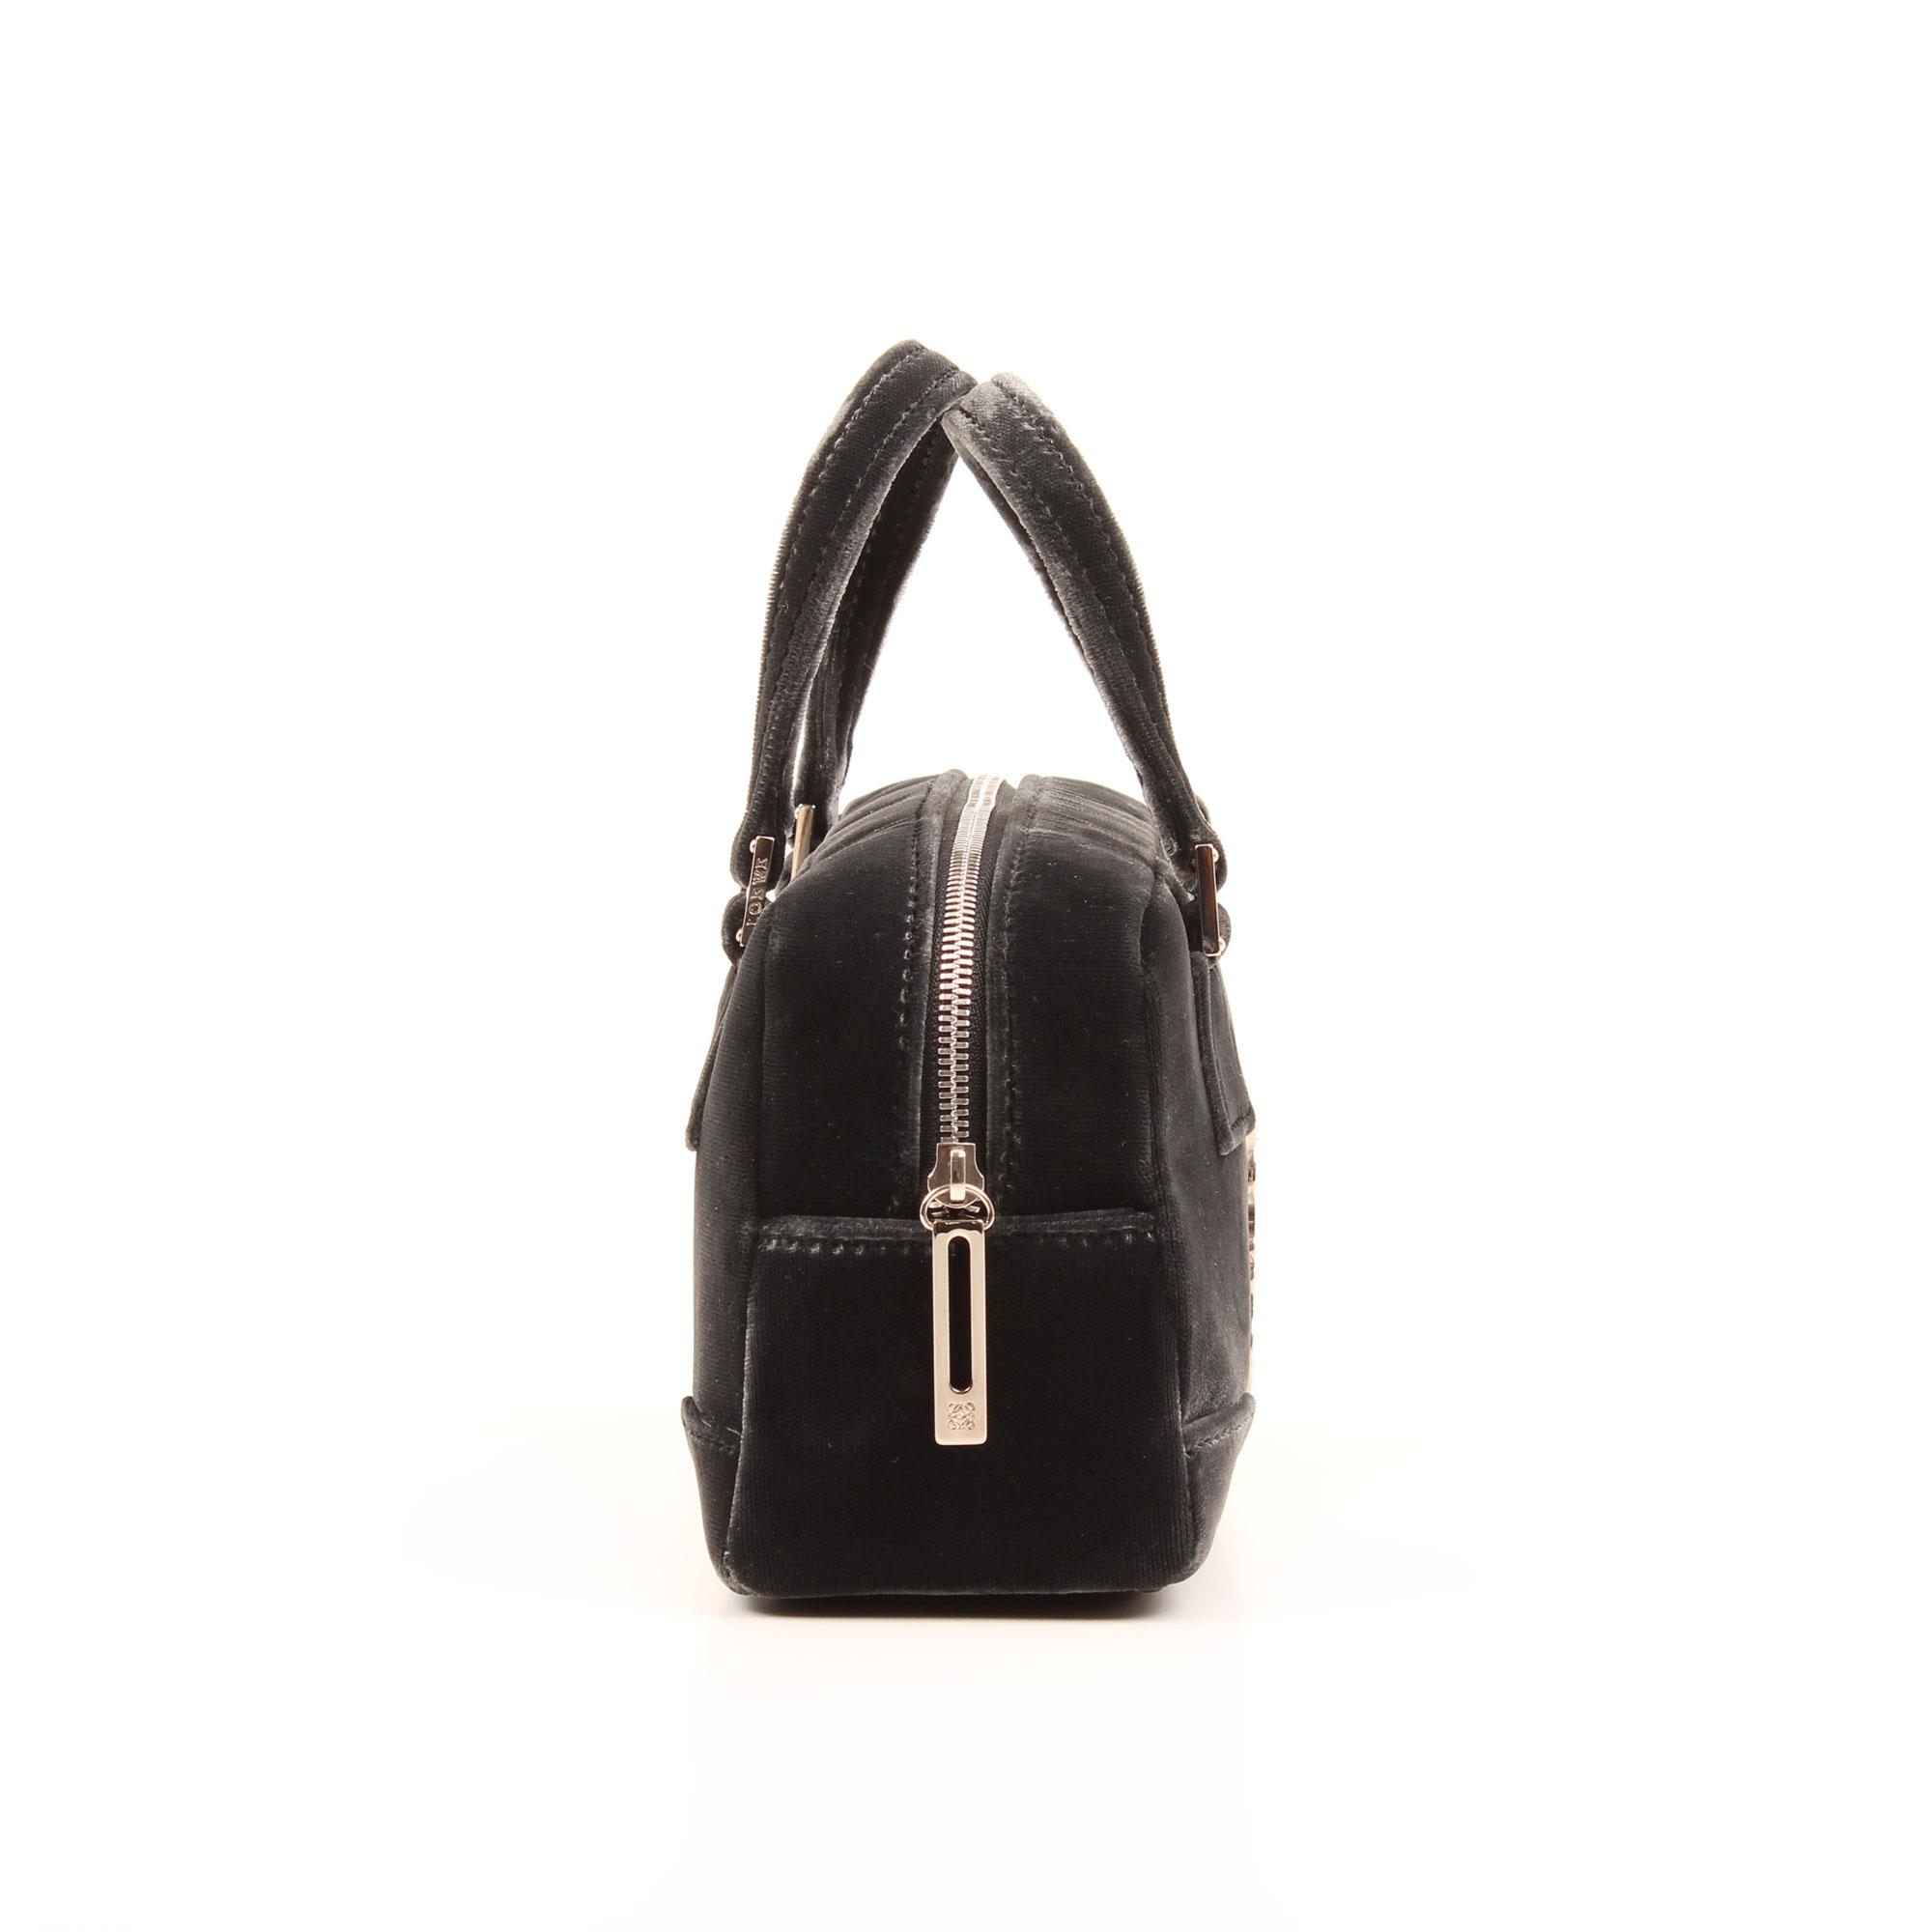 Imagen lateral del bolso de mano loewe amazona bb negro terciopelo